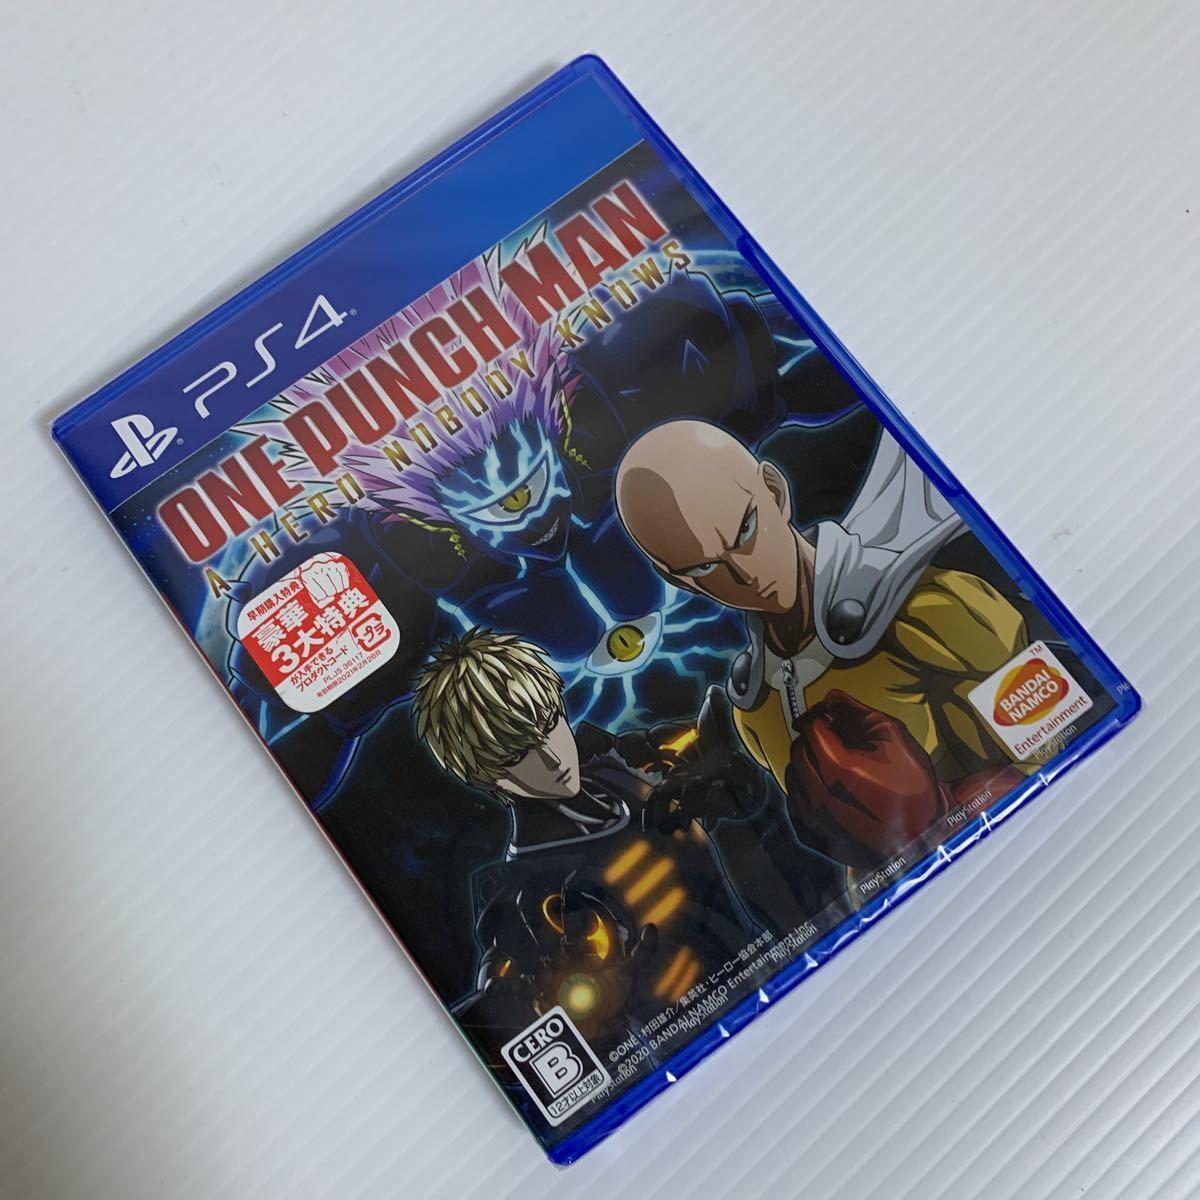 PS4 ONE PUNCH MAN A HERO NOBODY KNOWS 早期購入特典/豪華3大特典付